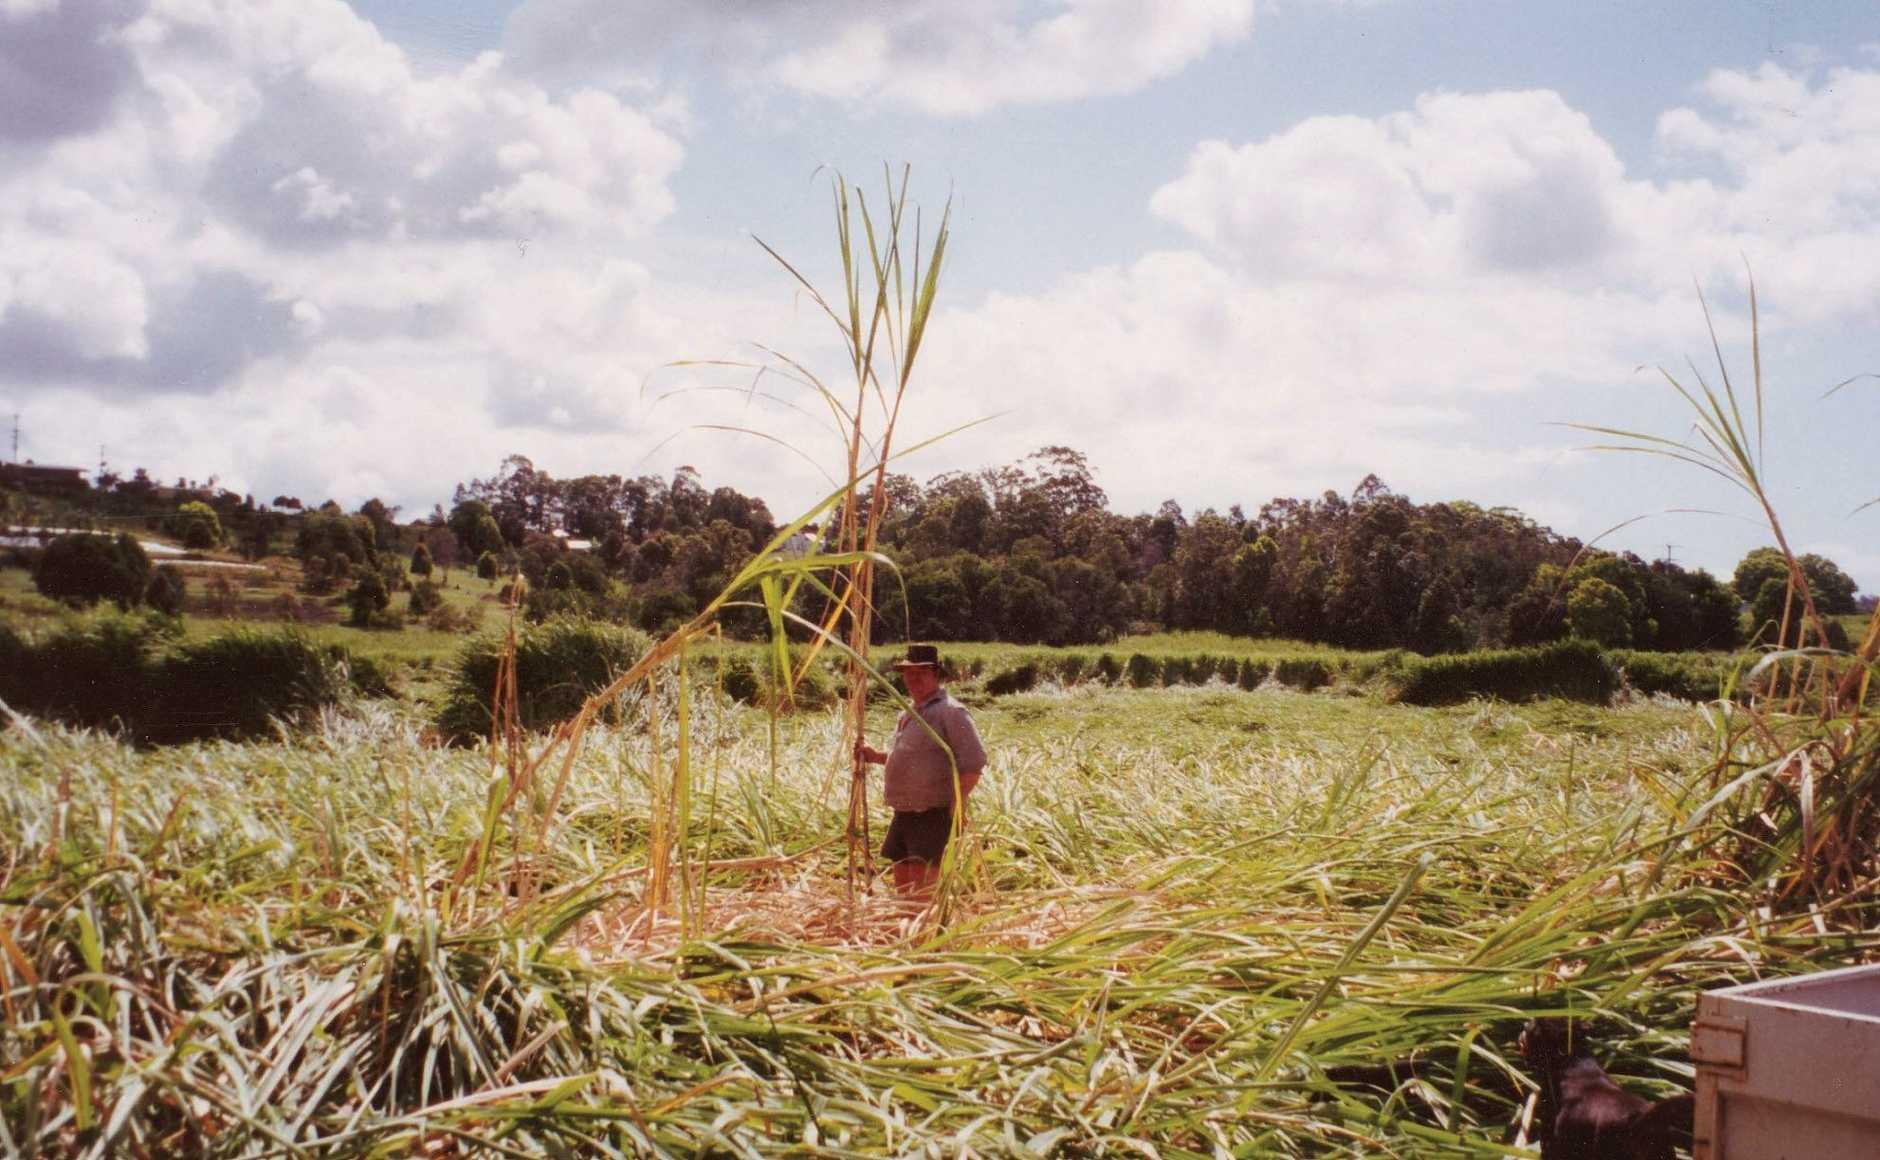 Cane  fields on the Sunshine Coast mysteriously  flattened overnight on  September 11, 1973.